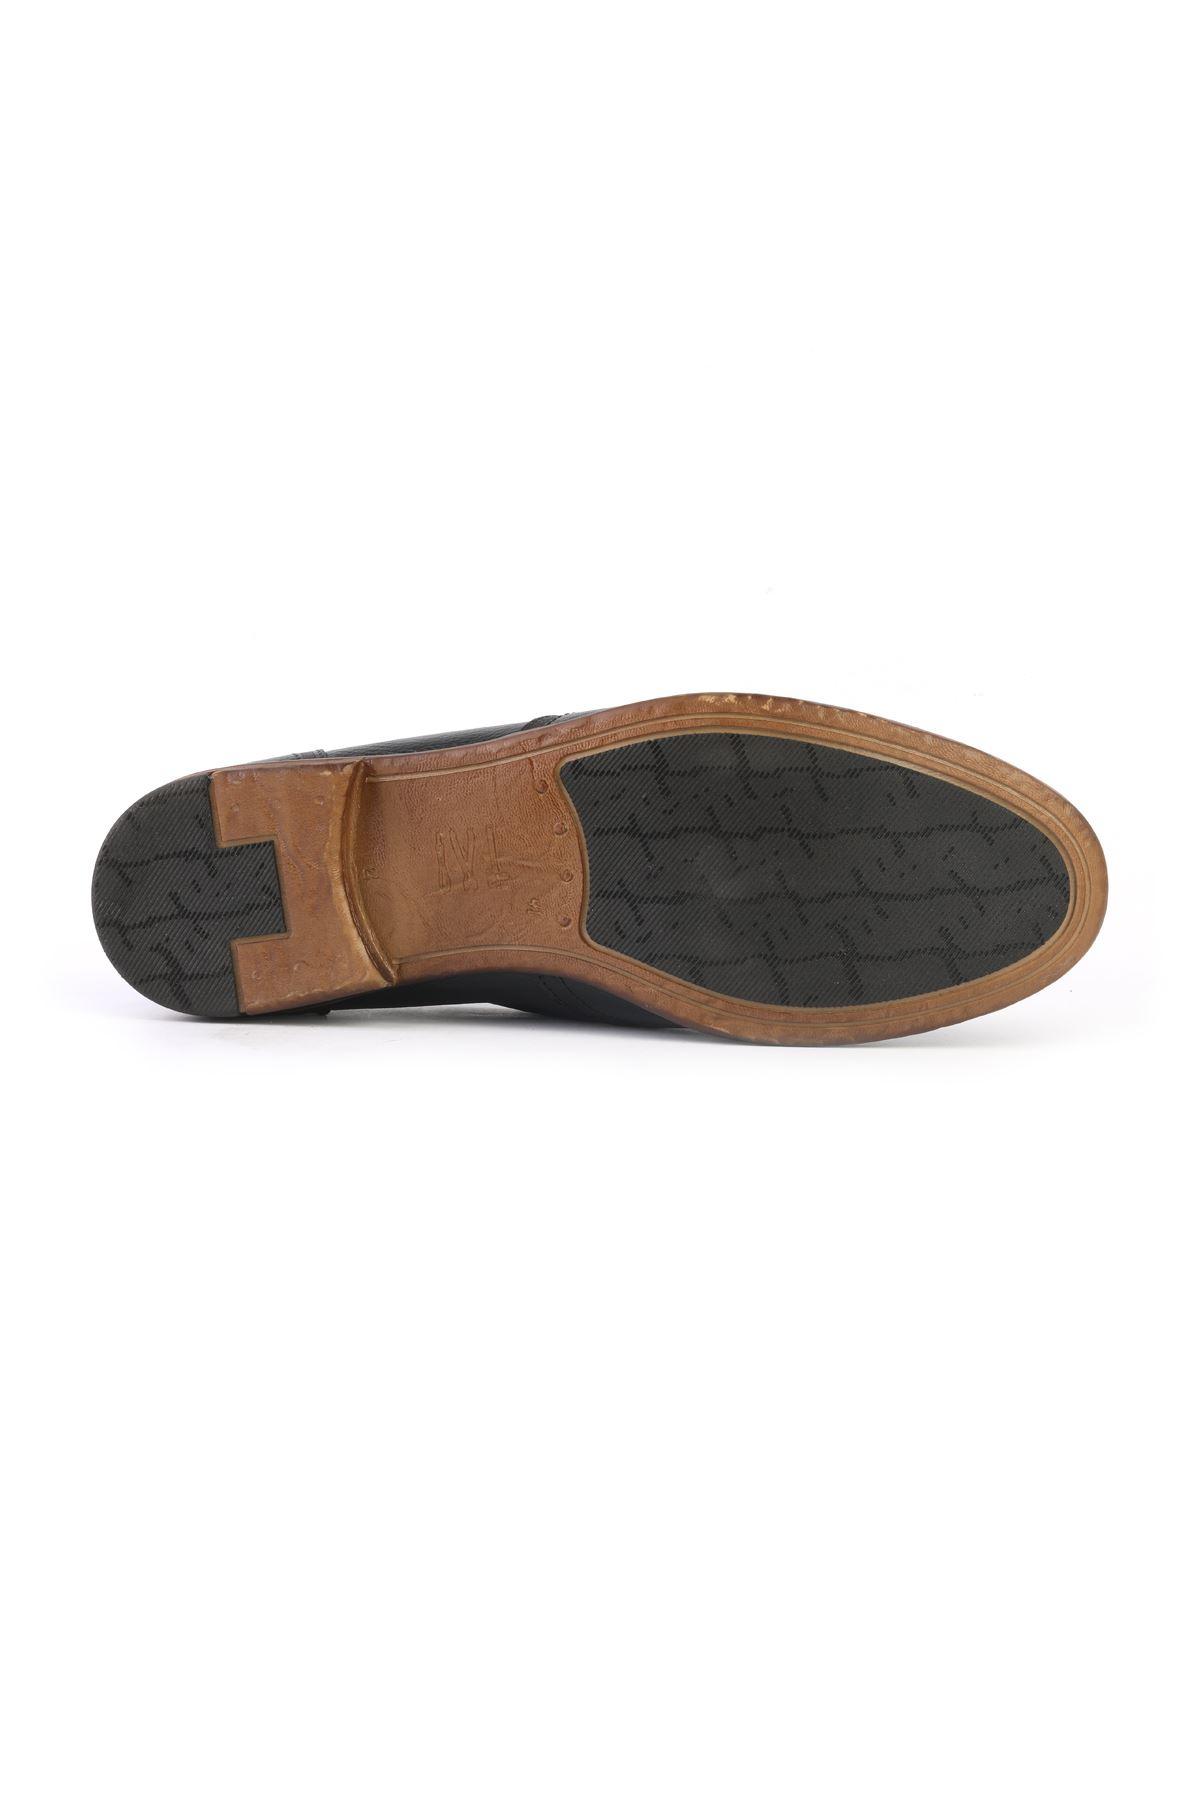 Libero T1163 Black Casual Shoes